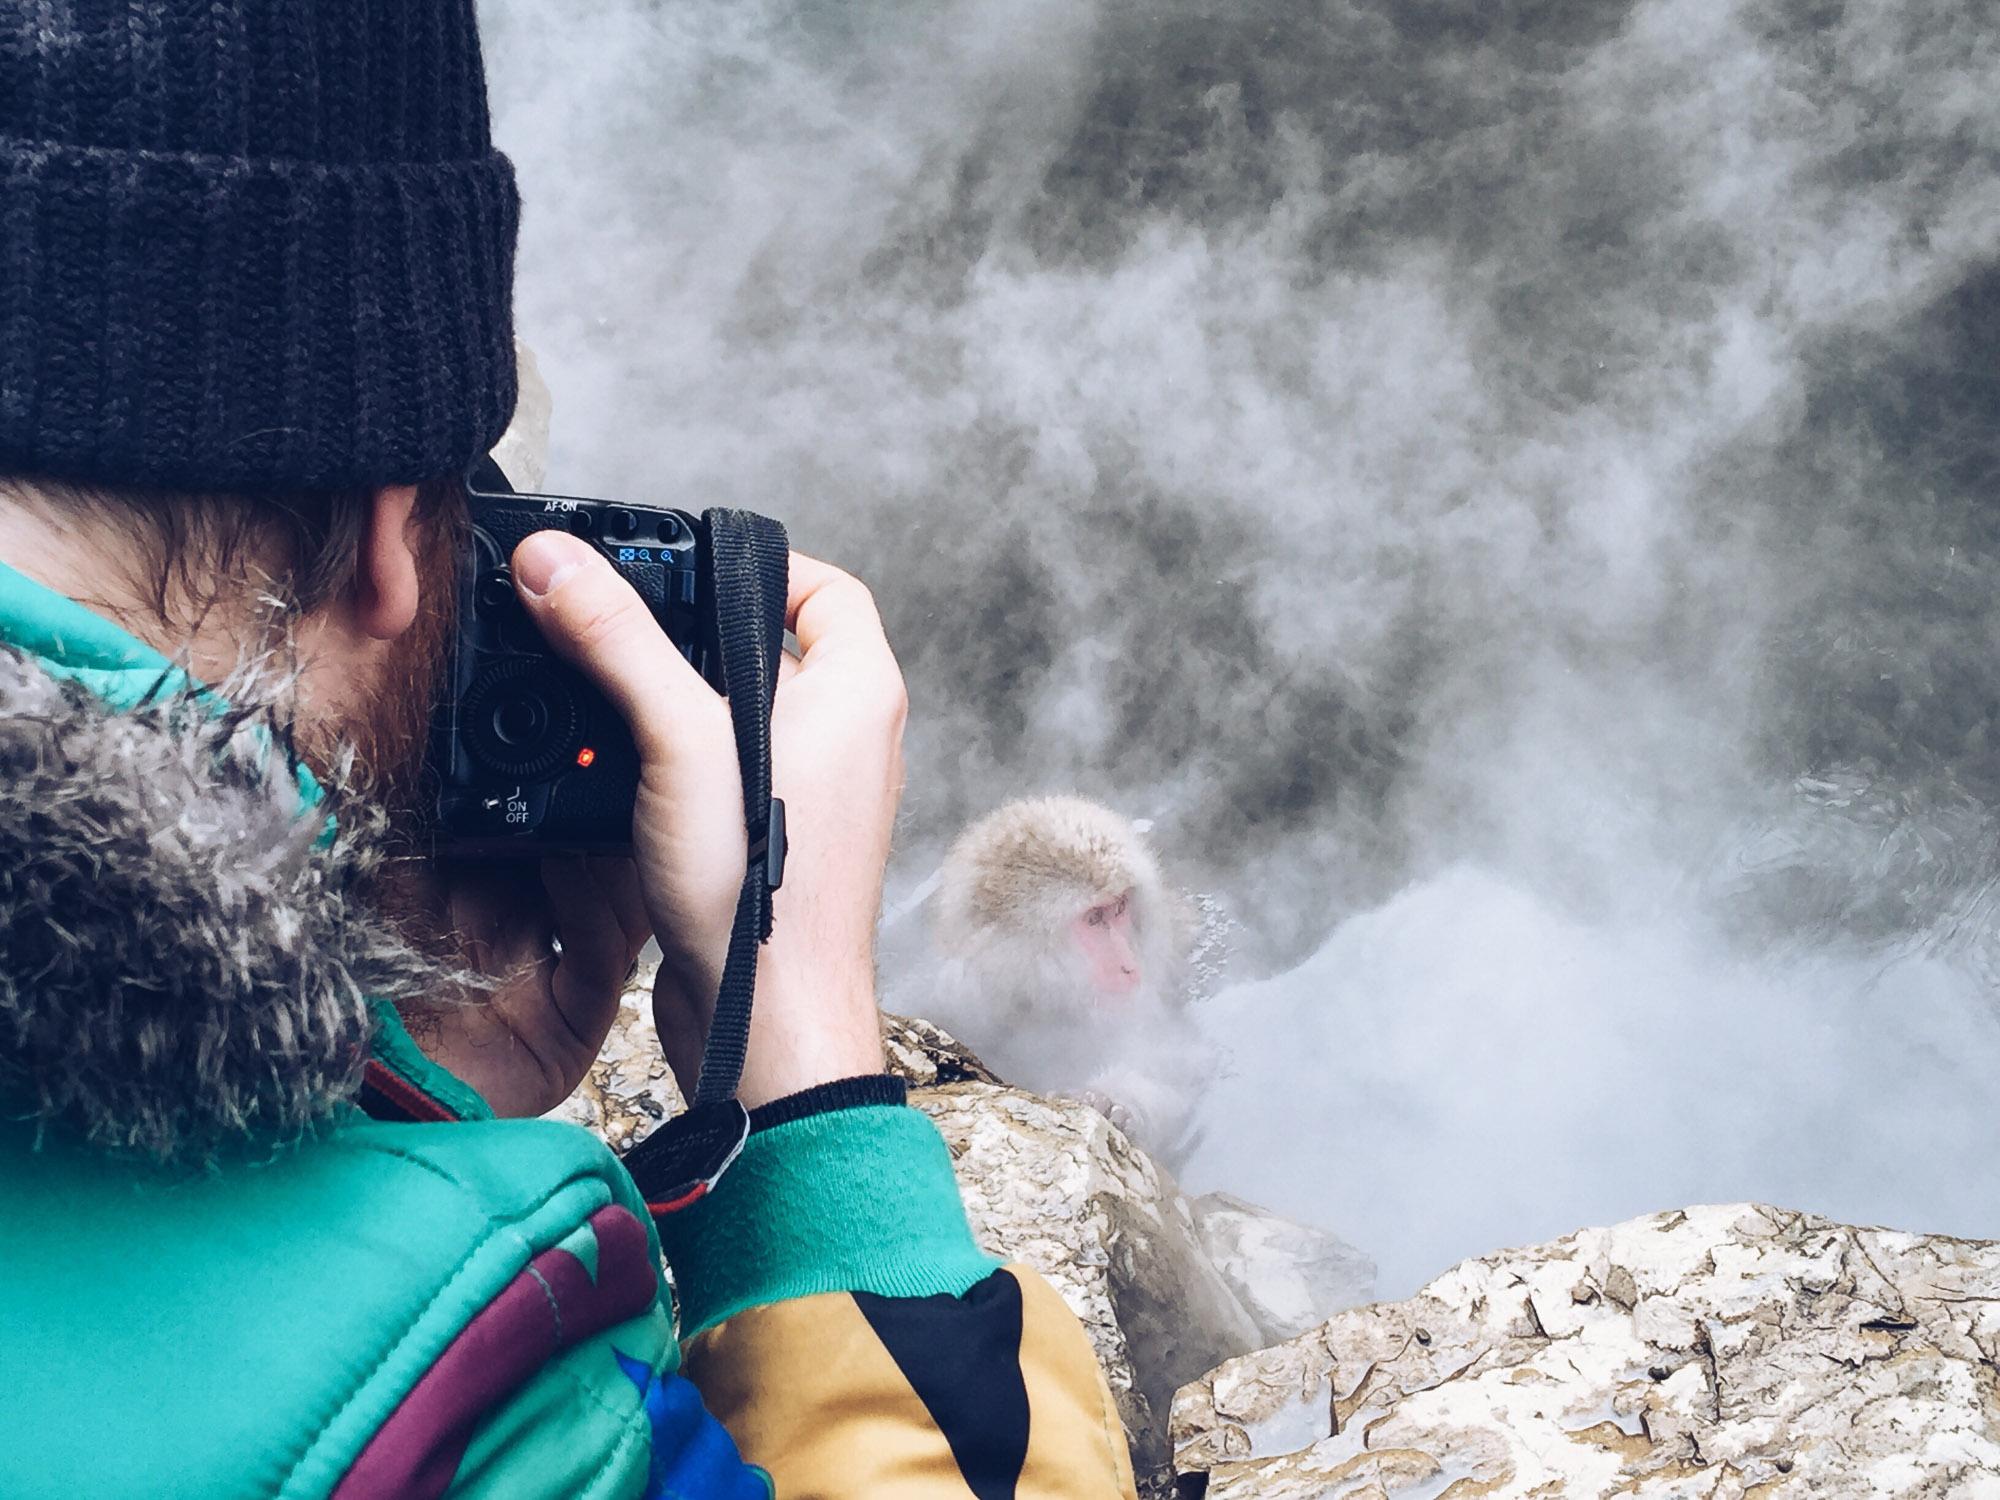 Instagramming Japan - steve with the snow monkeys